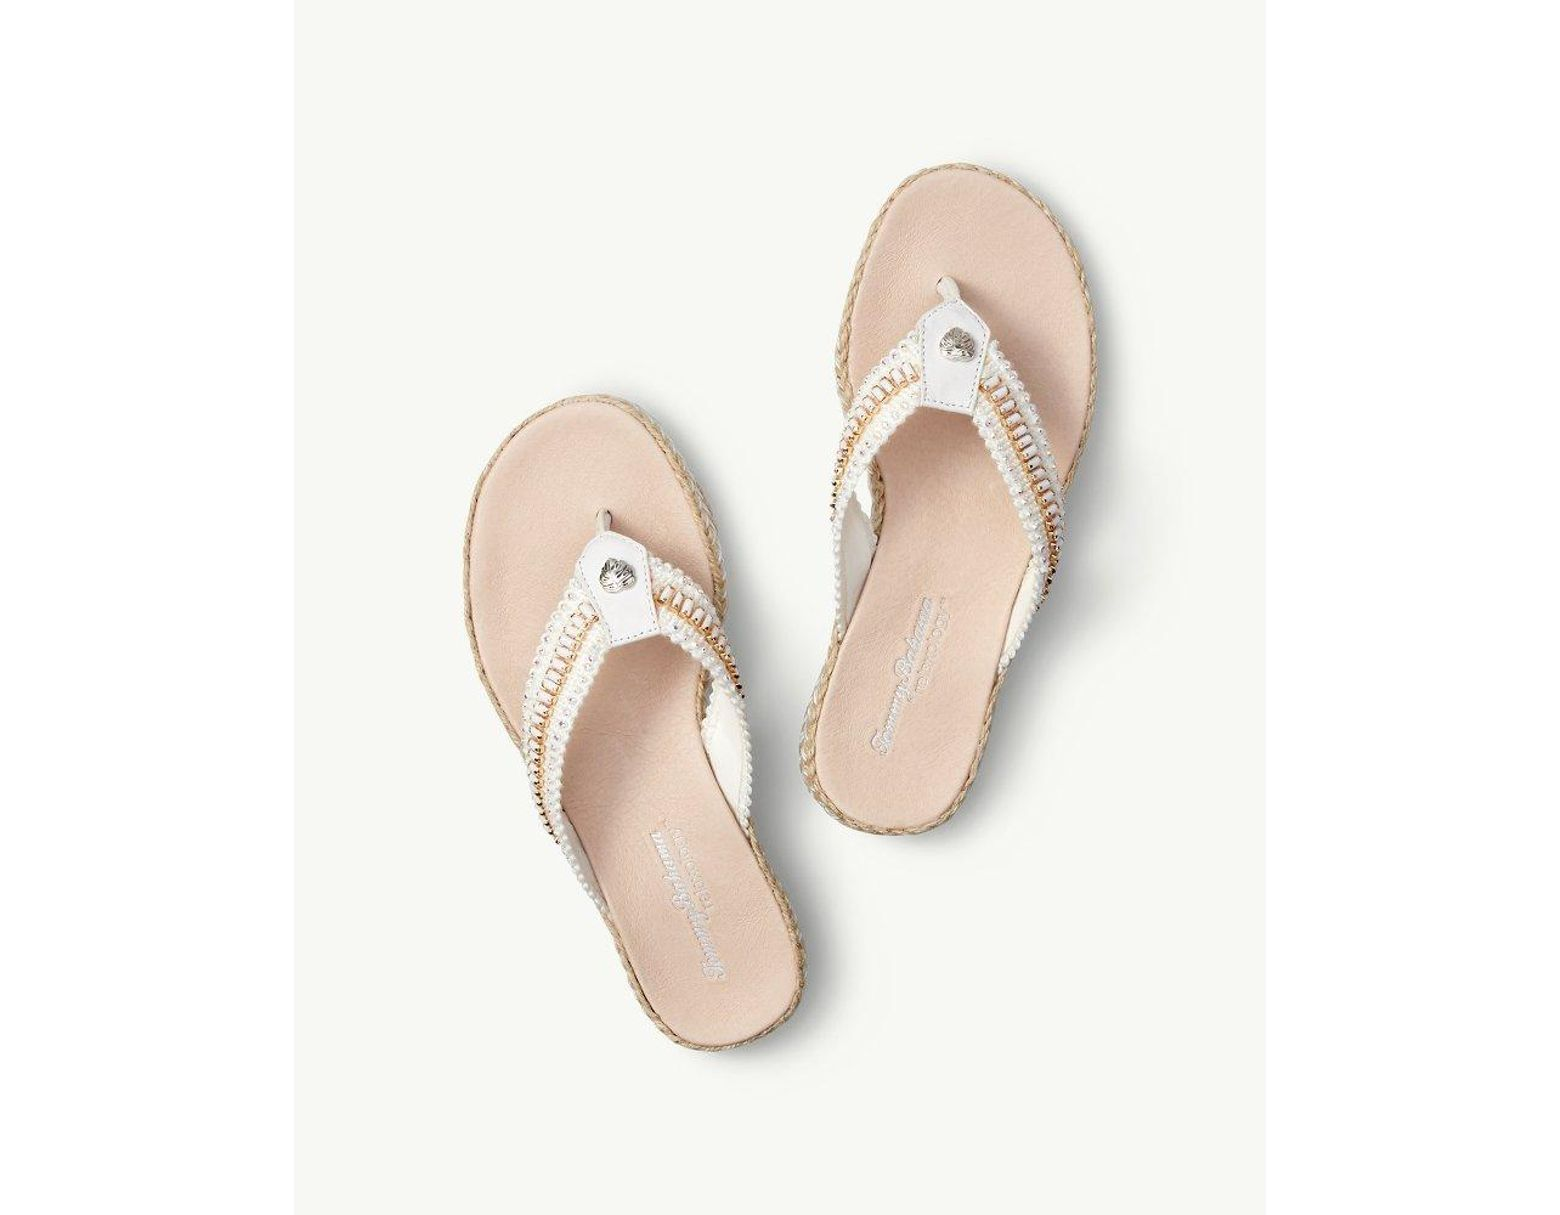 India White Sandals Women's Relaxology® Women's White India Relaxology® White Women's Sandals D92WIEHY